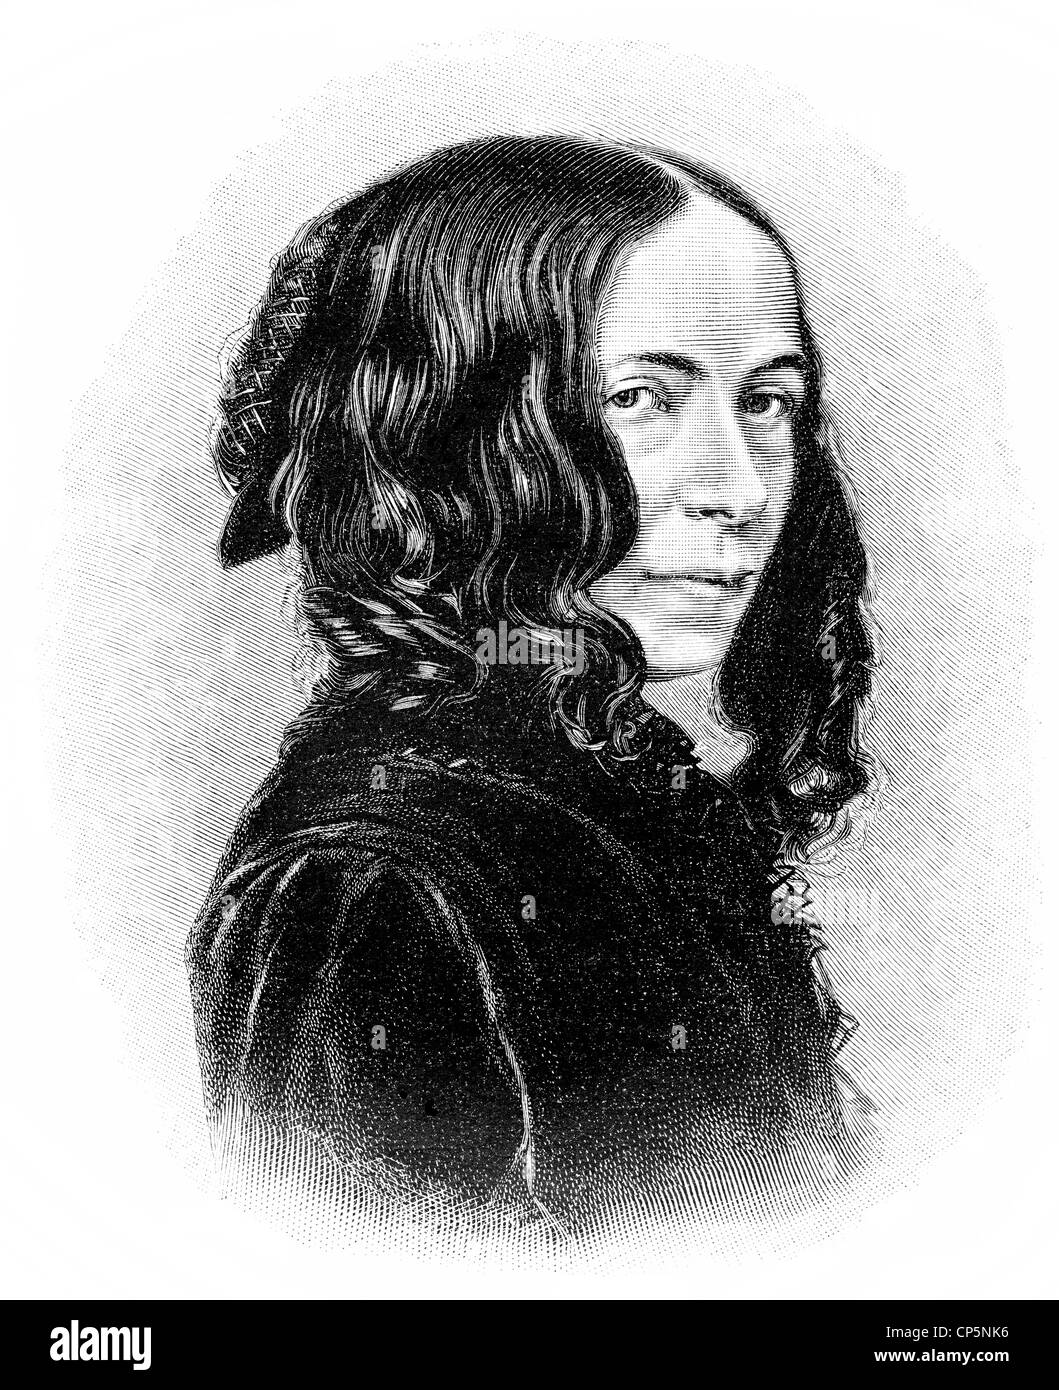 Elizabeth Barrett Browning, an English poet, 1806 - 1861 - Stock Image